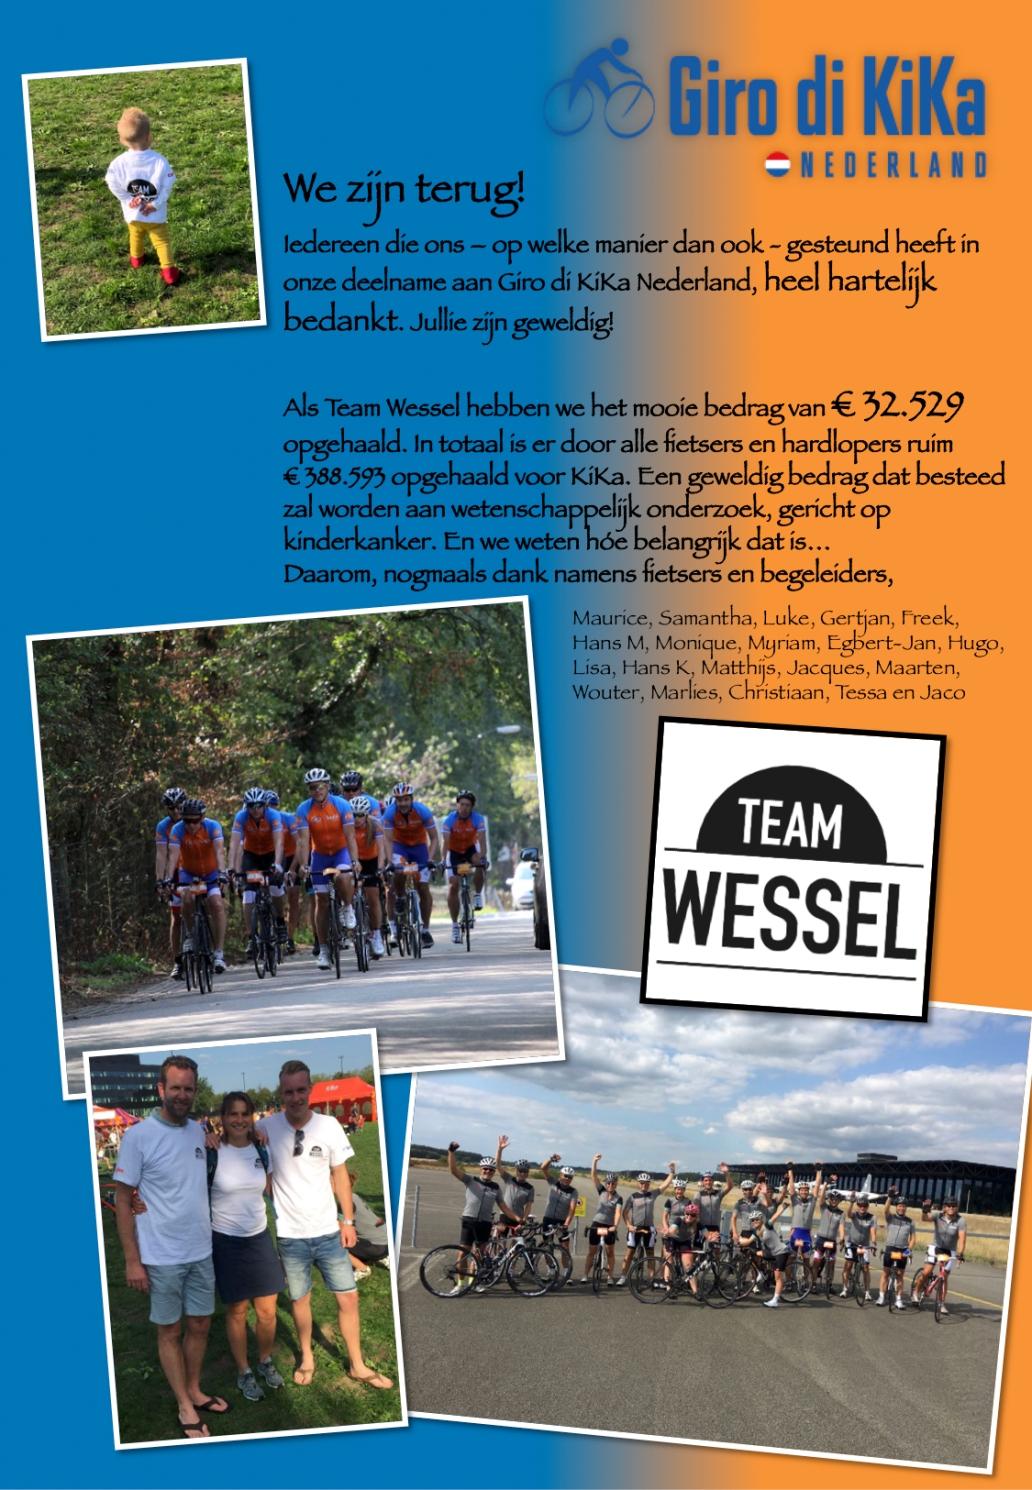 Bedankt - TEAM WESSEL